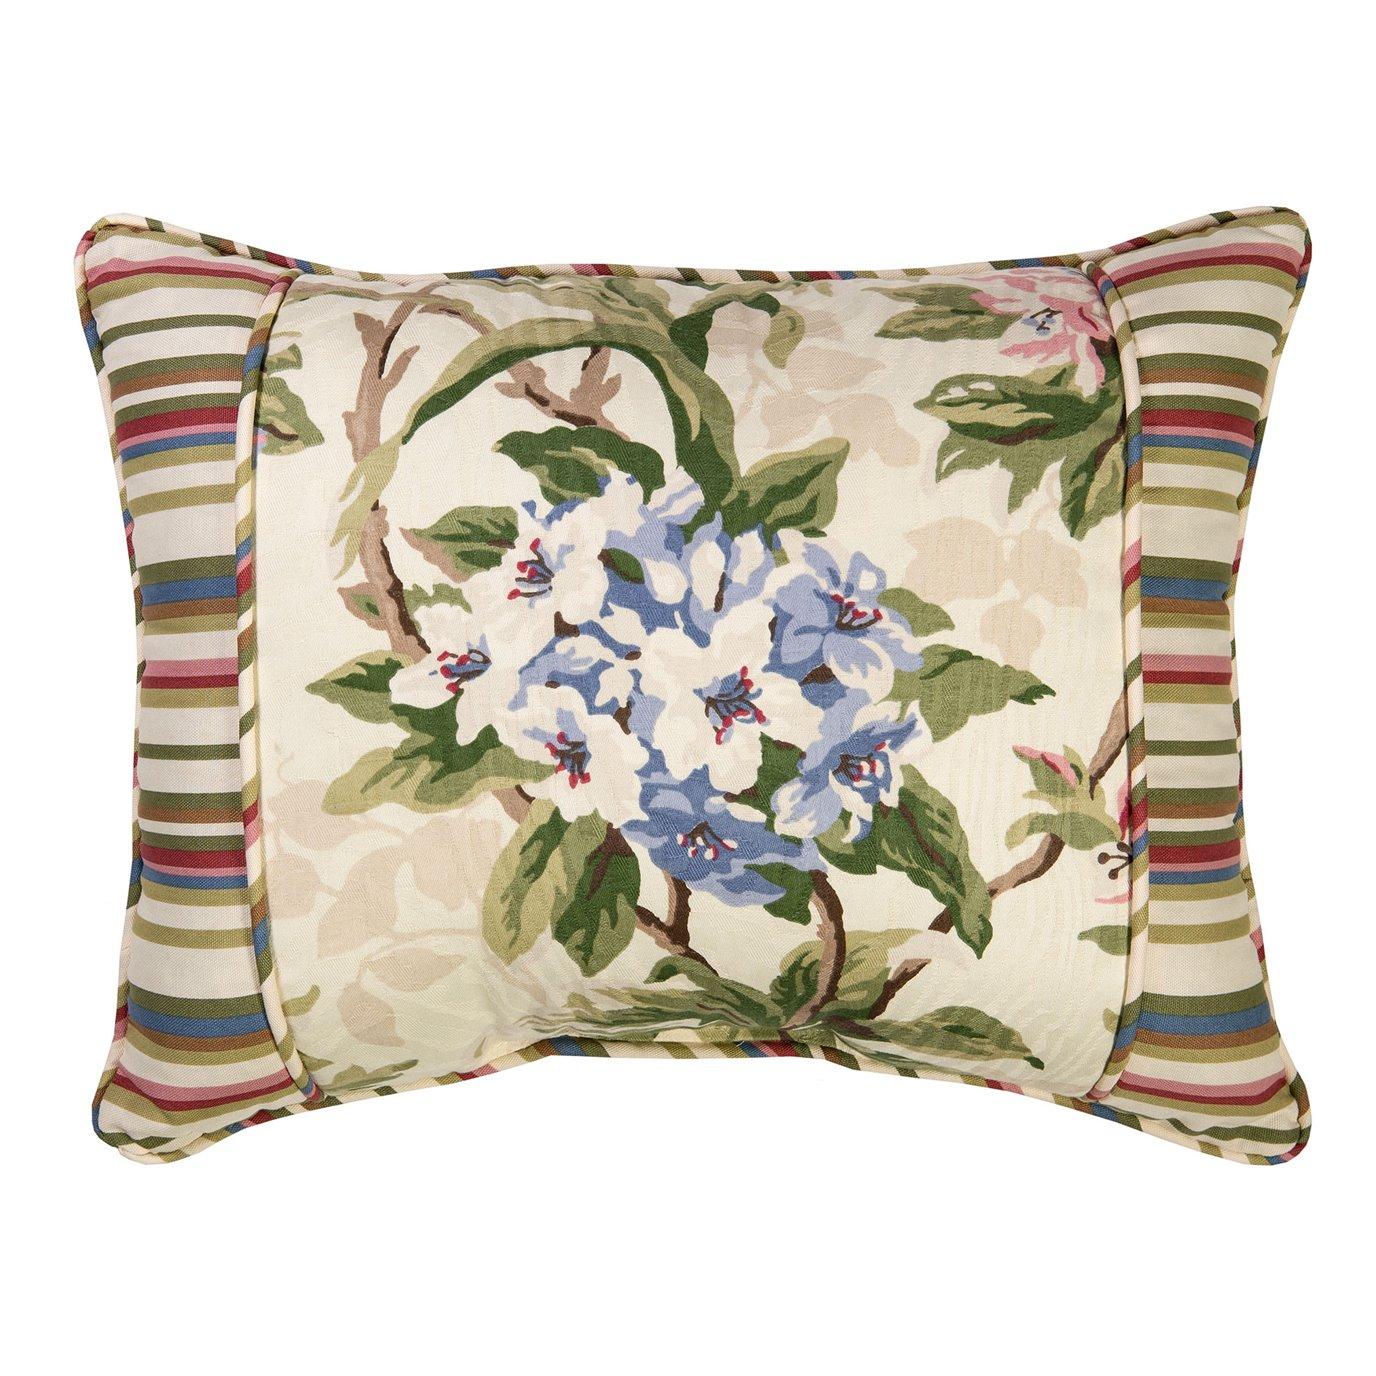 Hillhouse Breakfast Pillow - with stripe border